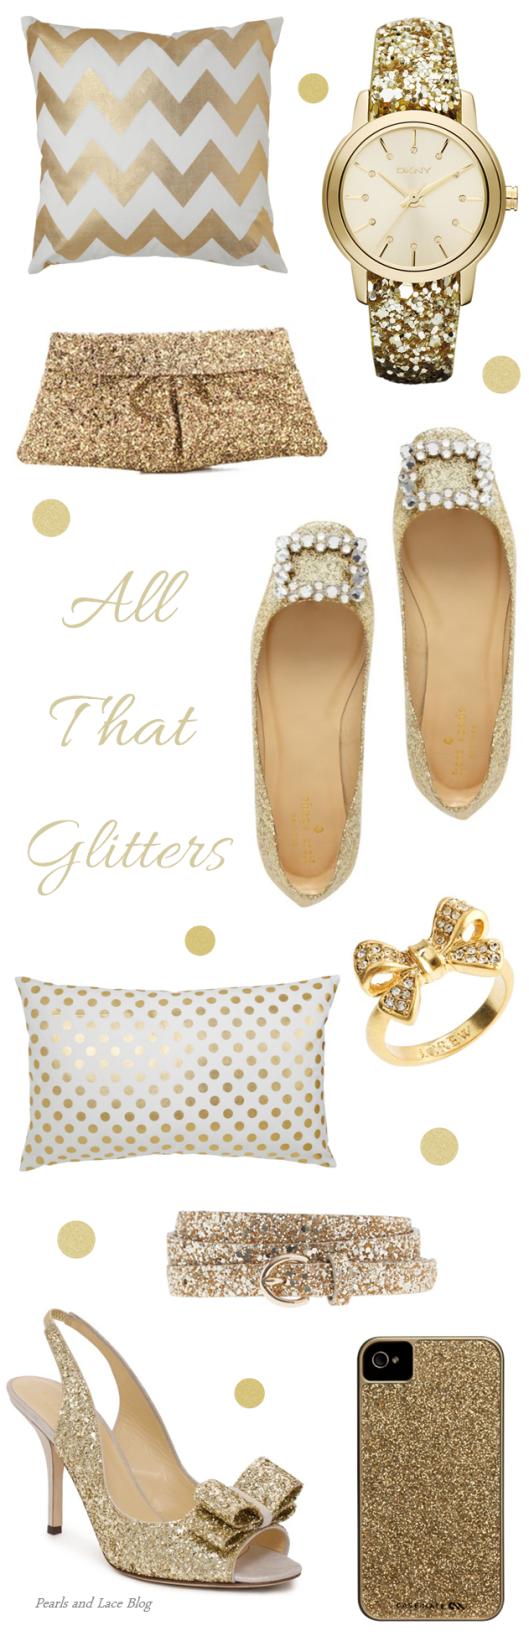 Gold Glitter Accessories